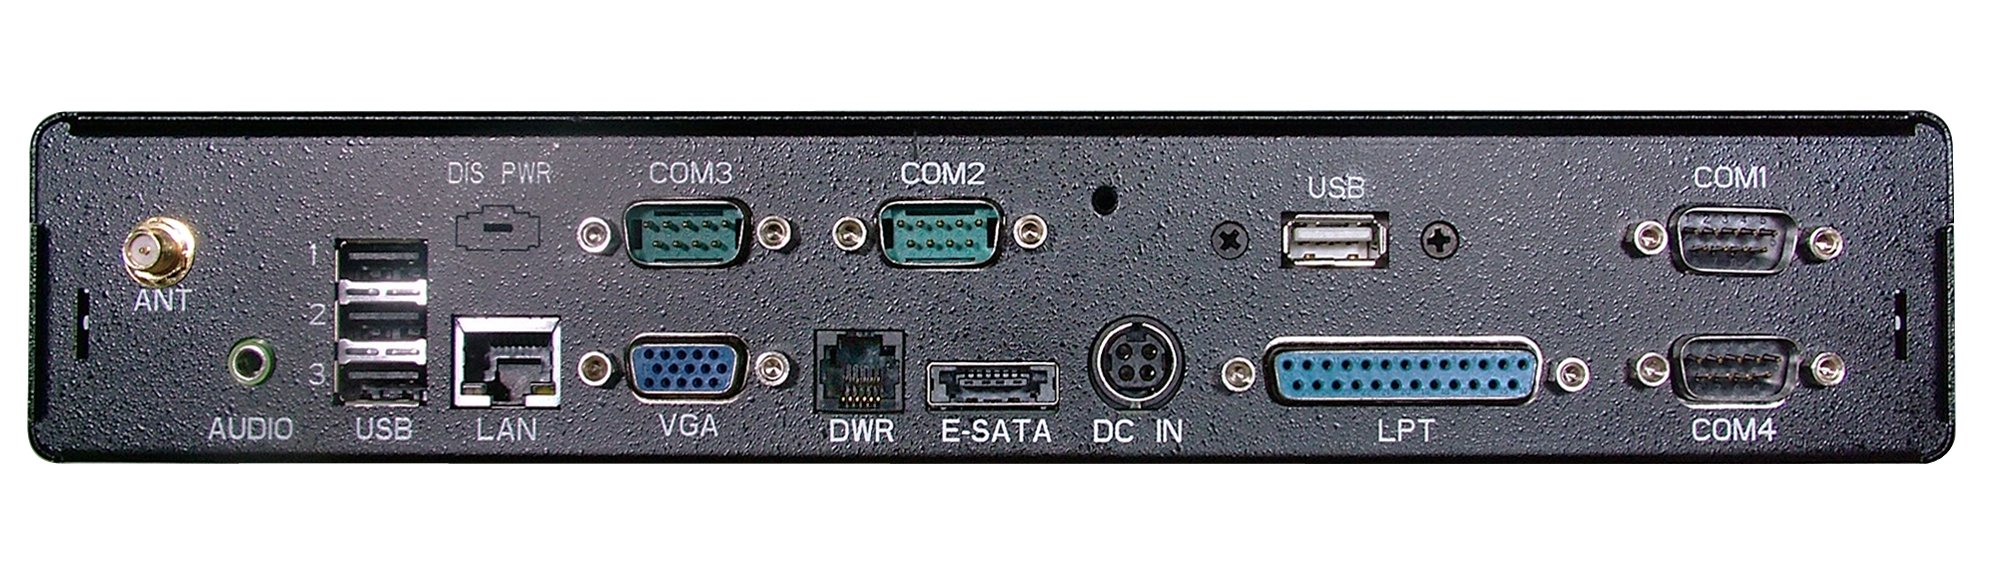 PC Box - PA-8025